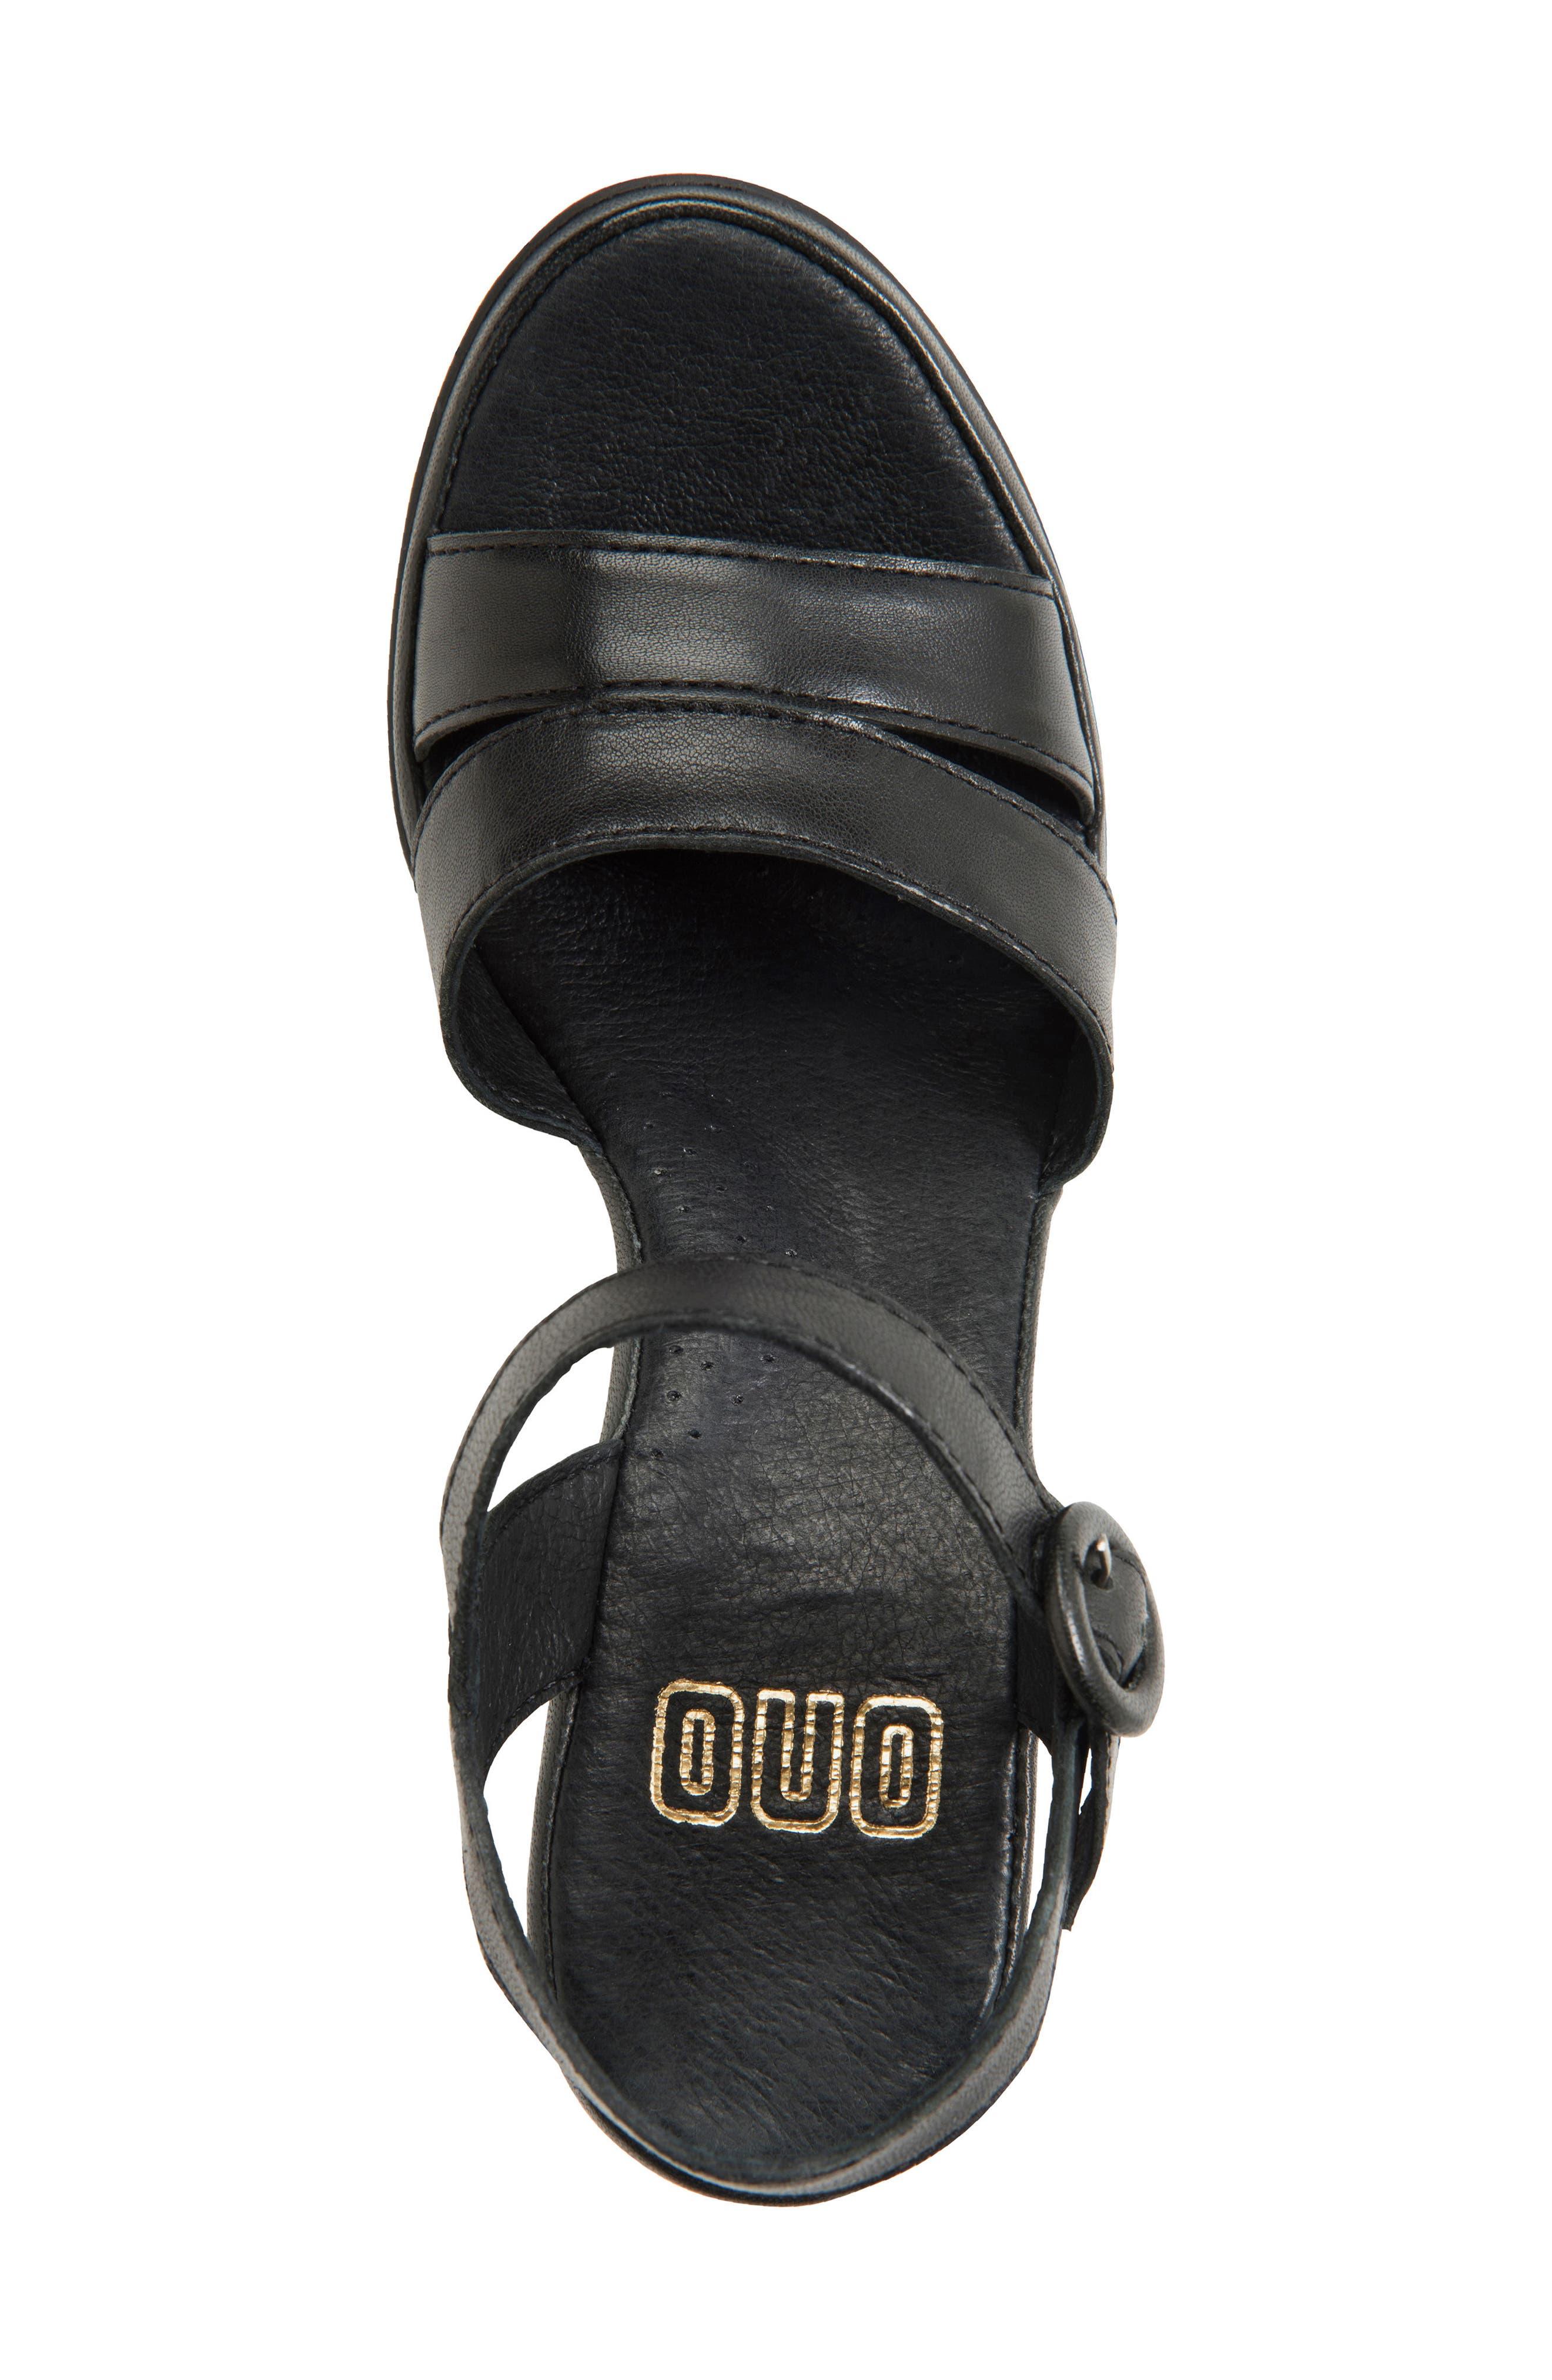 Hydro Wedge Sandal,                             Alternate thumbnail 3, color,                             Black Leather